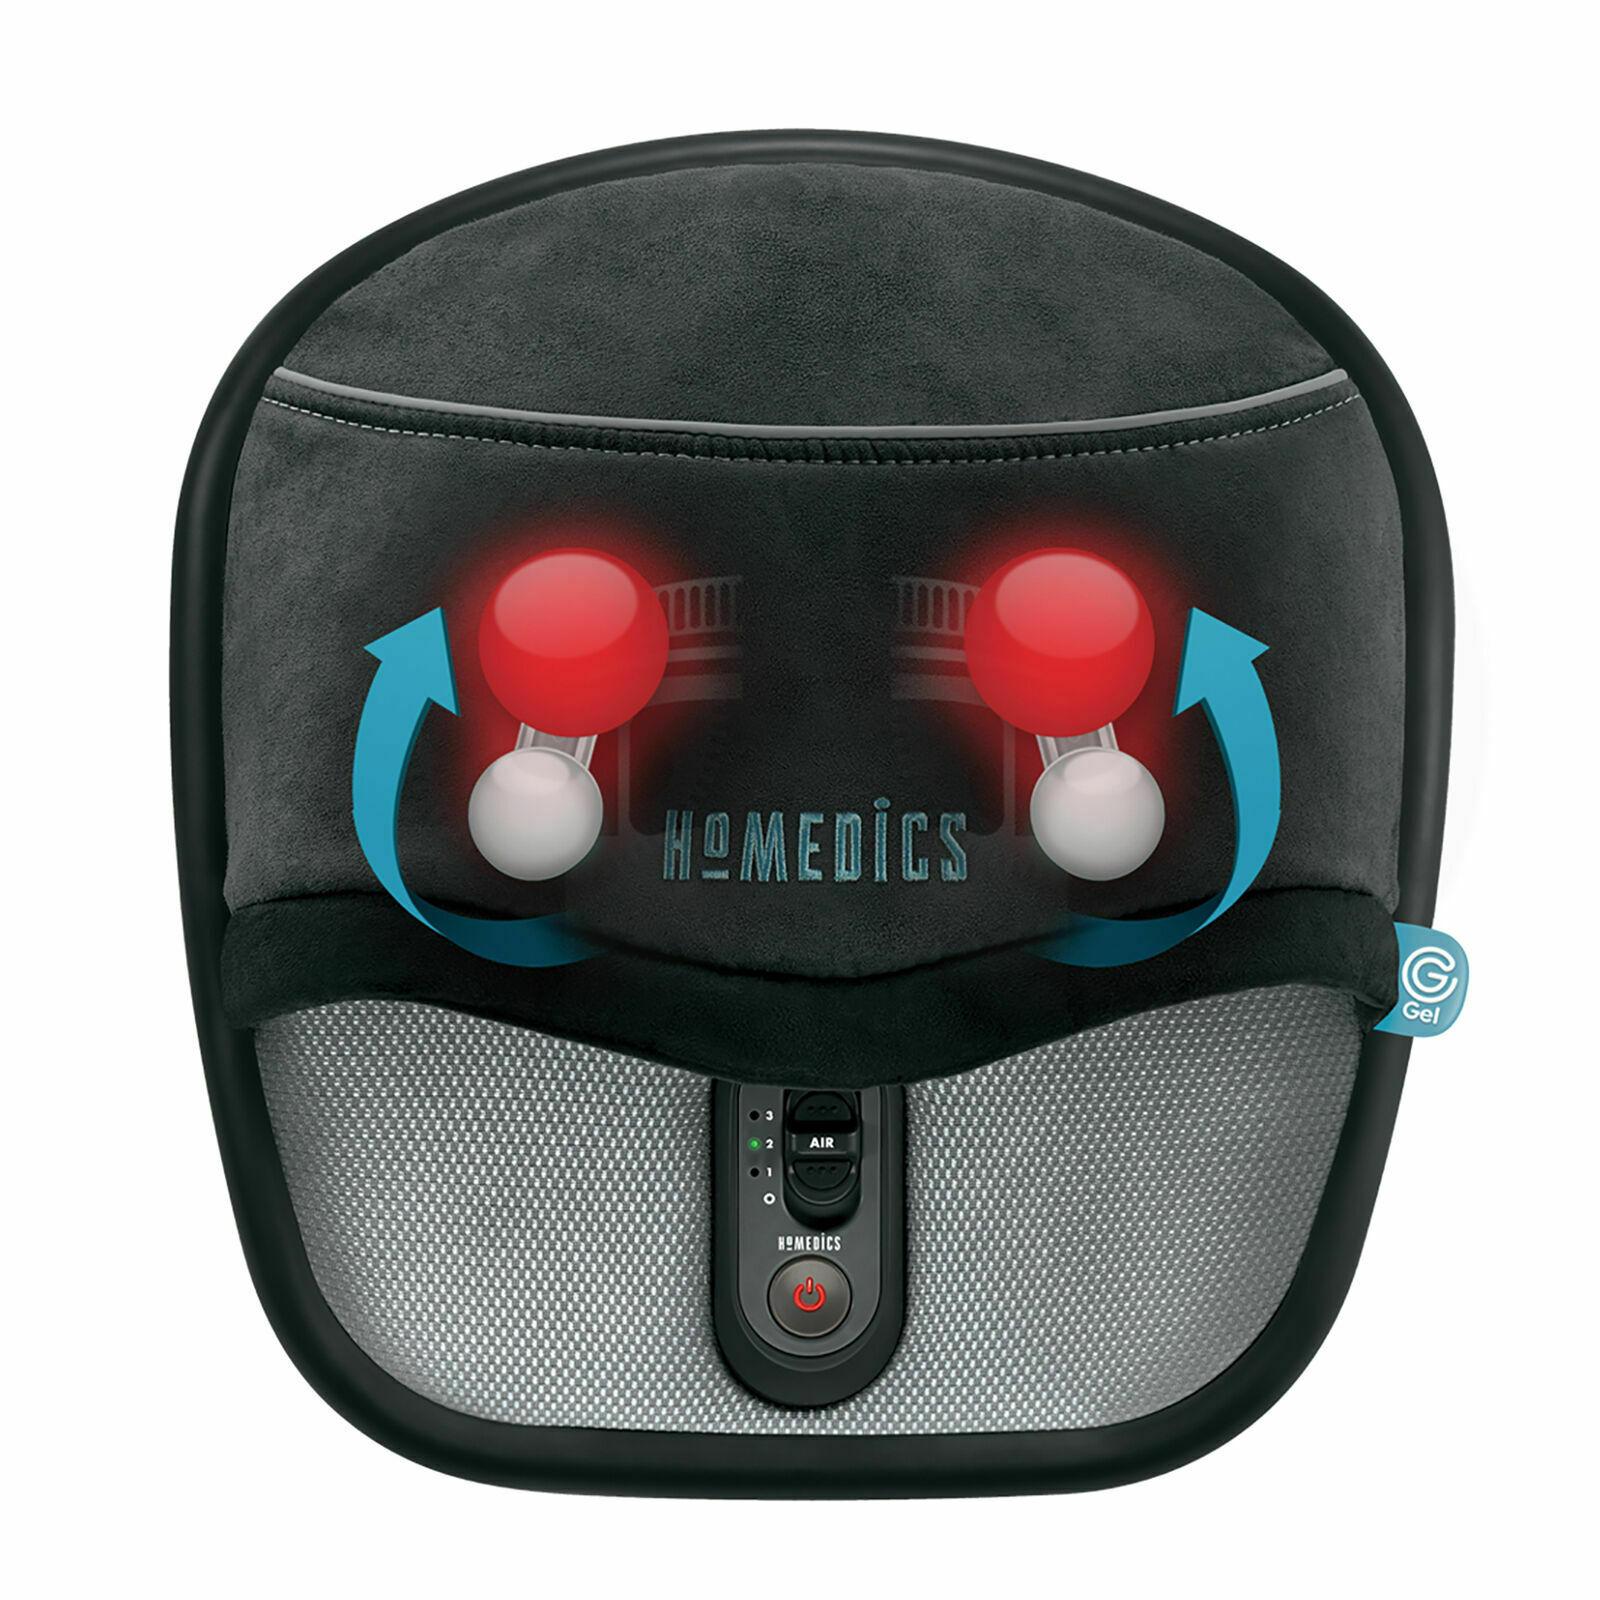 HoMedics Shiatsu Foot Massager (Refurb) £39.99 Delivered @ eBay / helpdesk_it